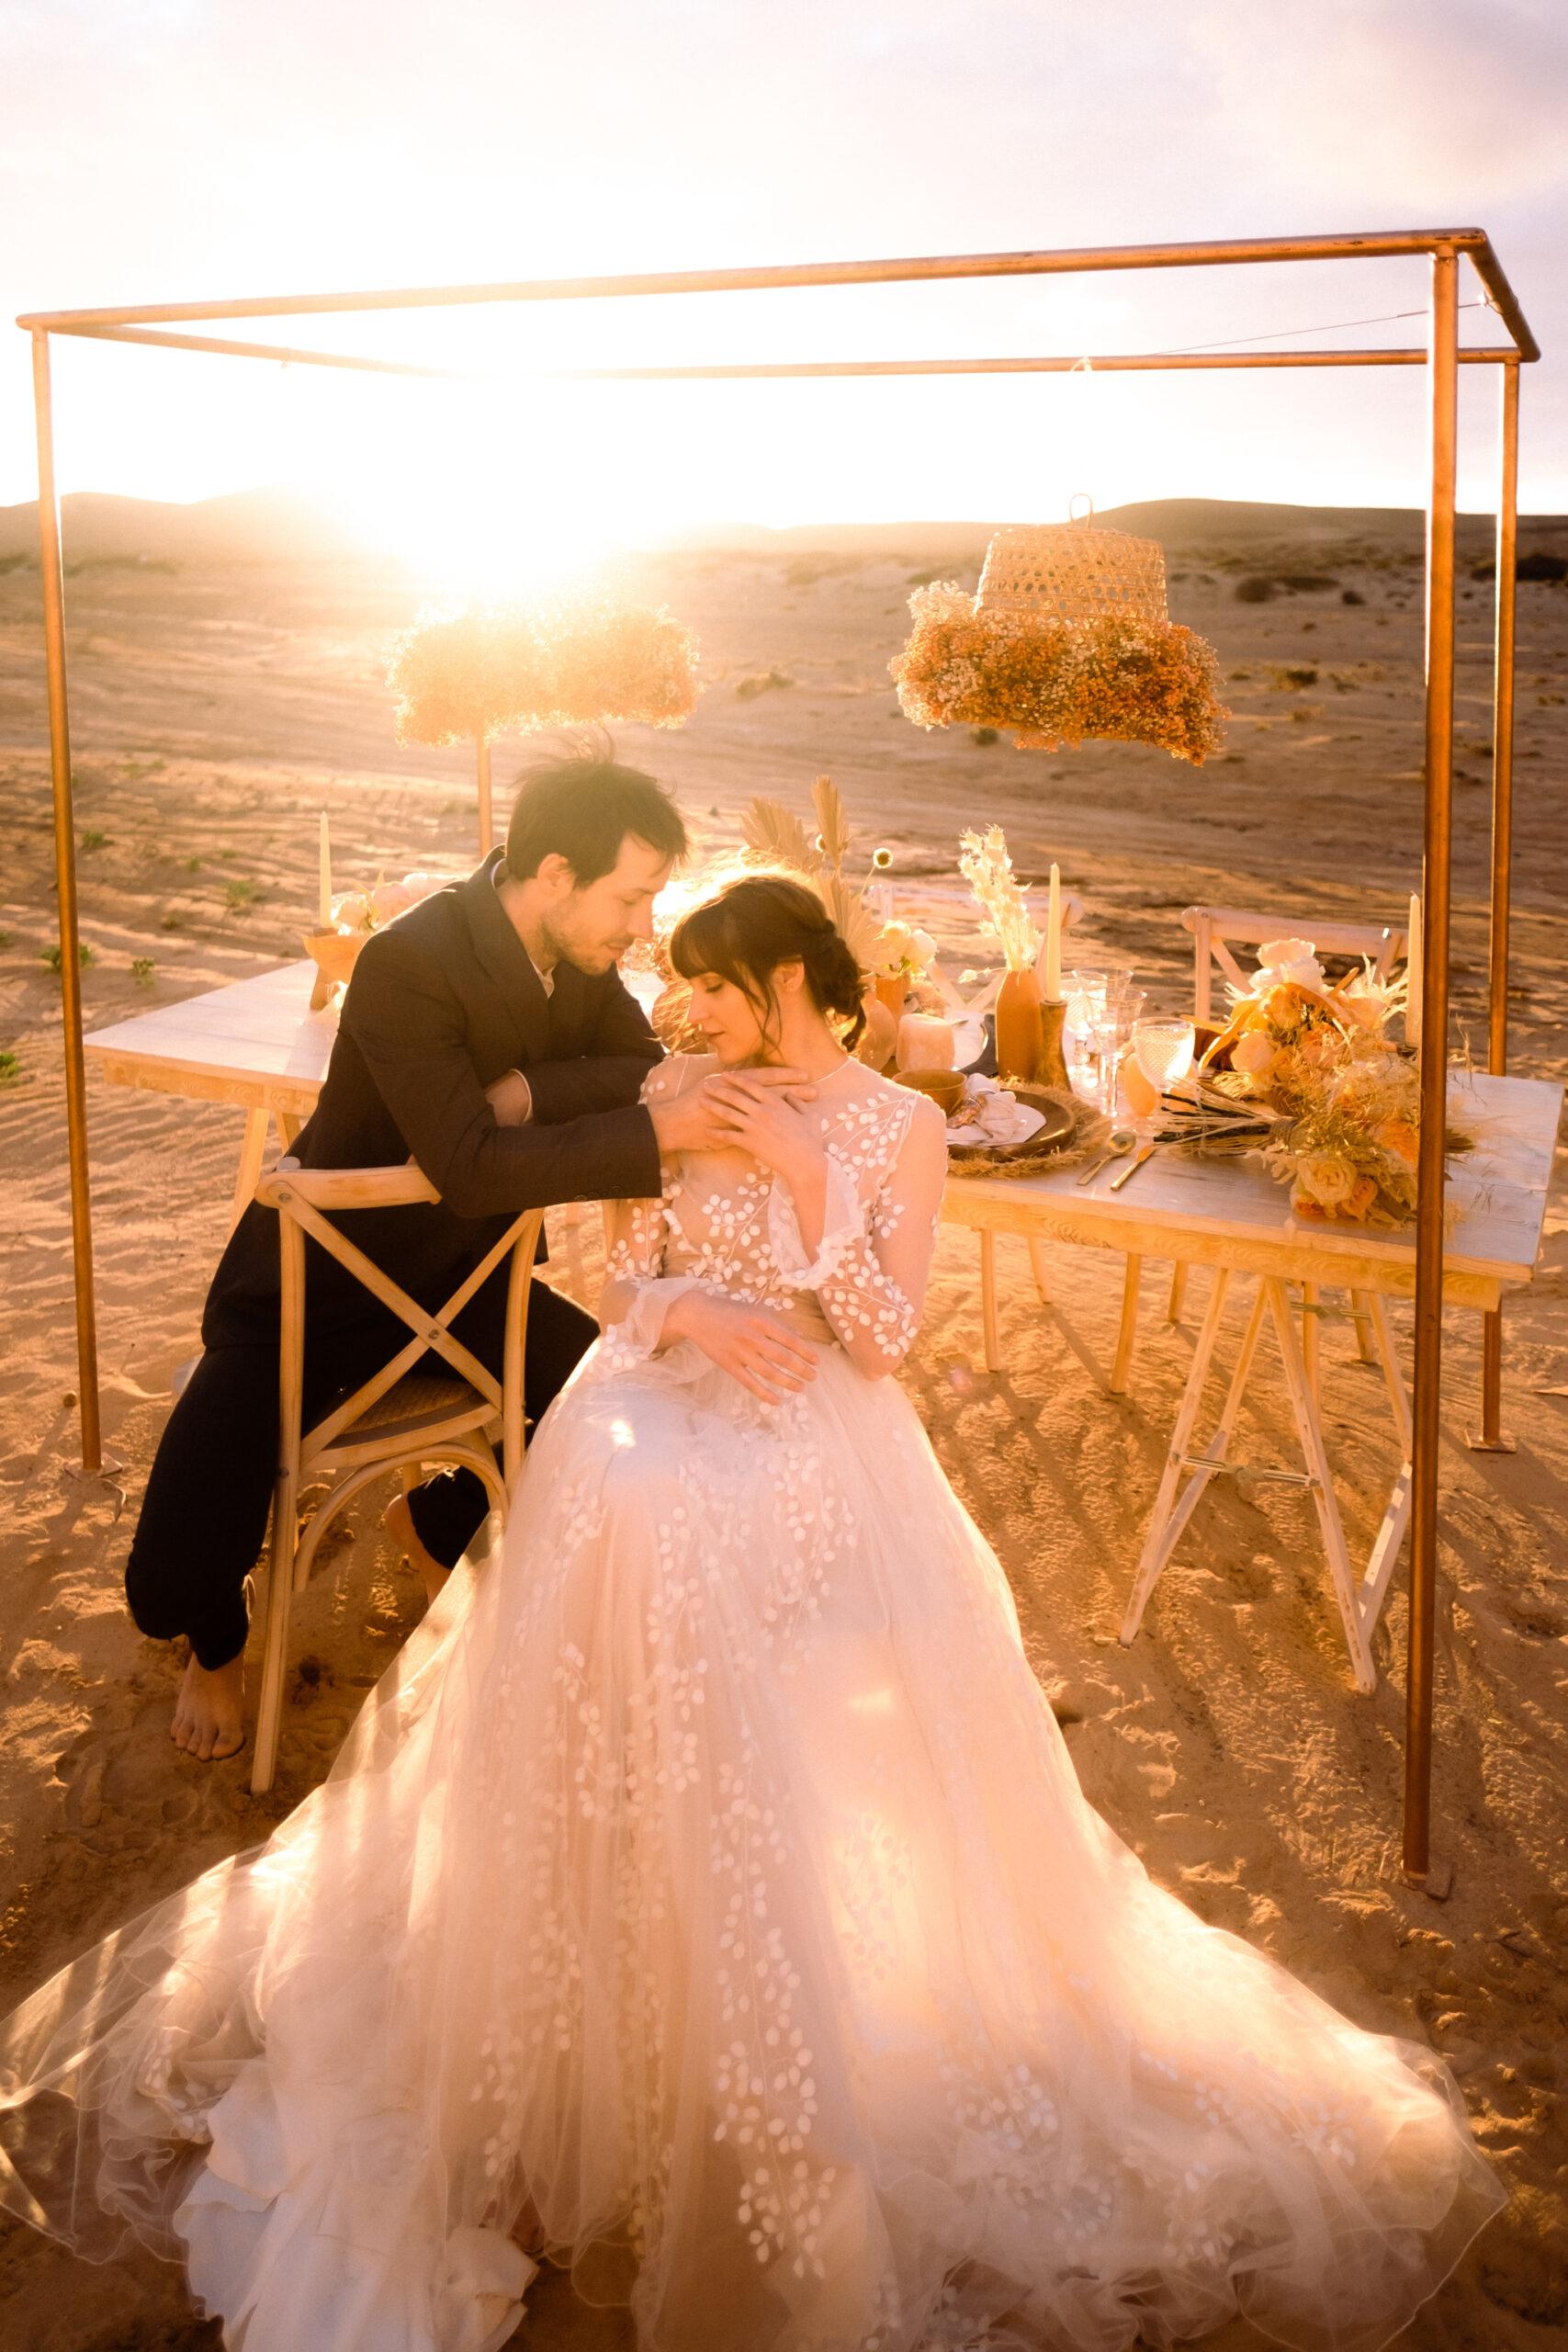 elopement wedding ideas and inspiration